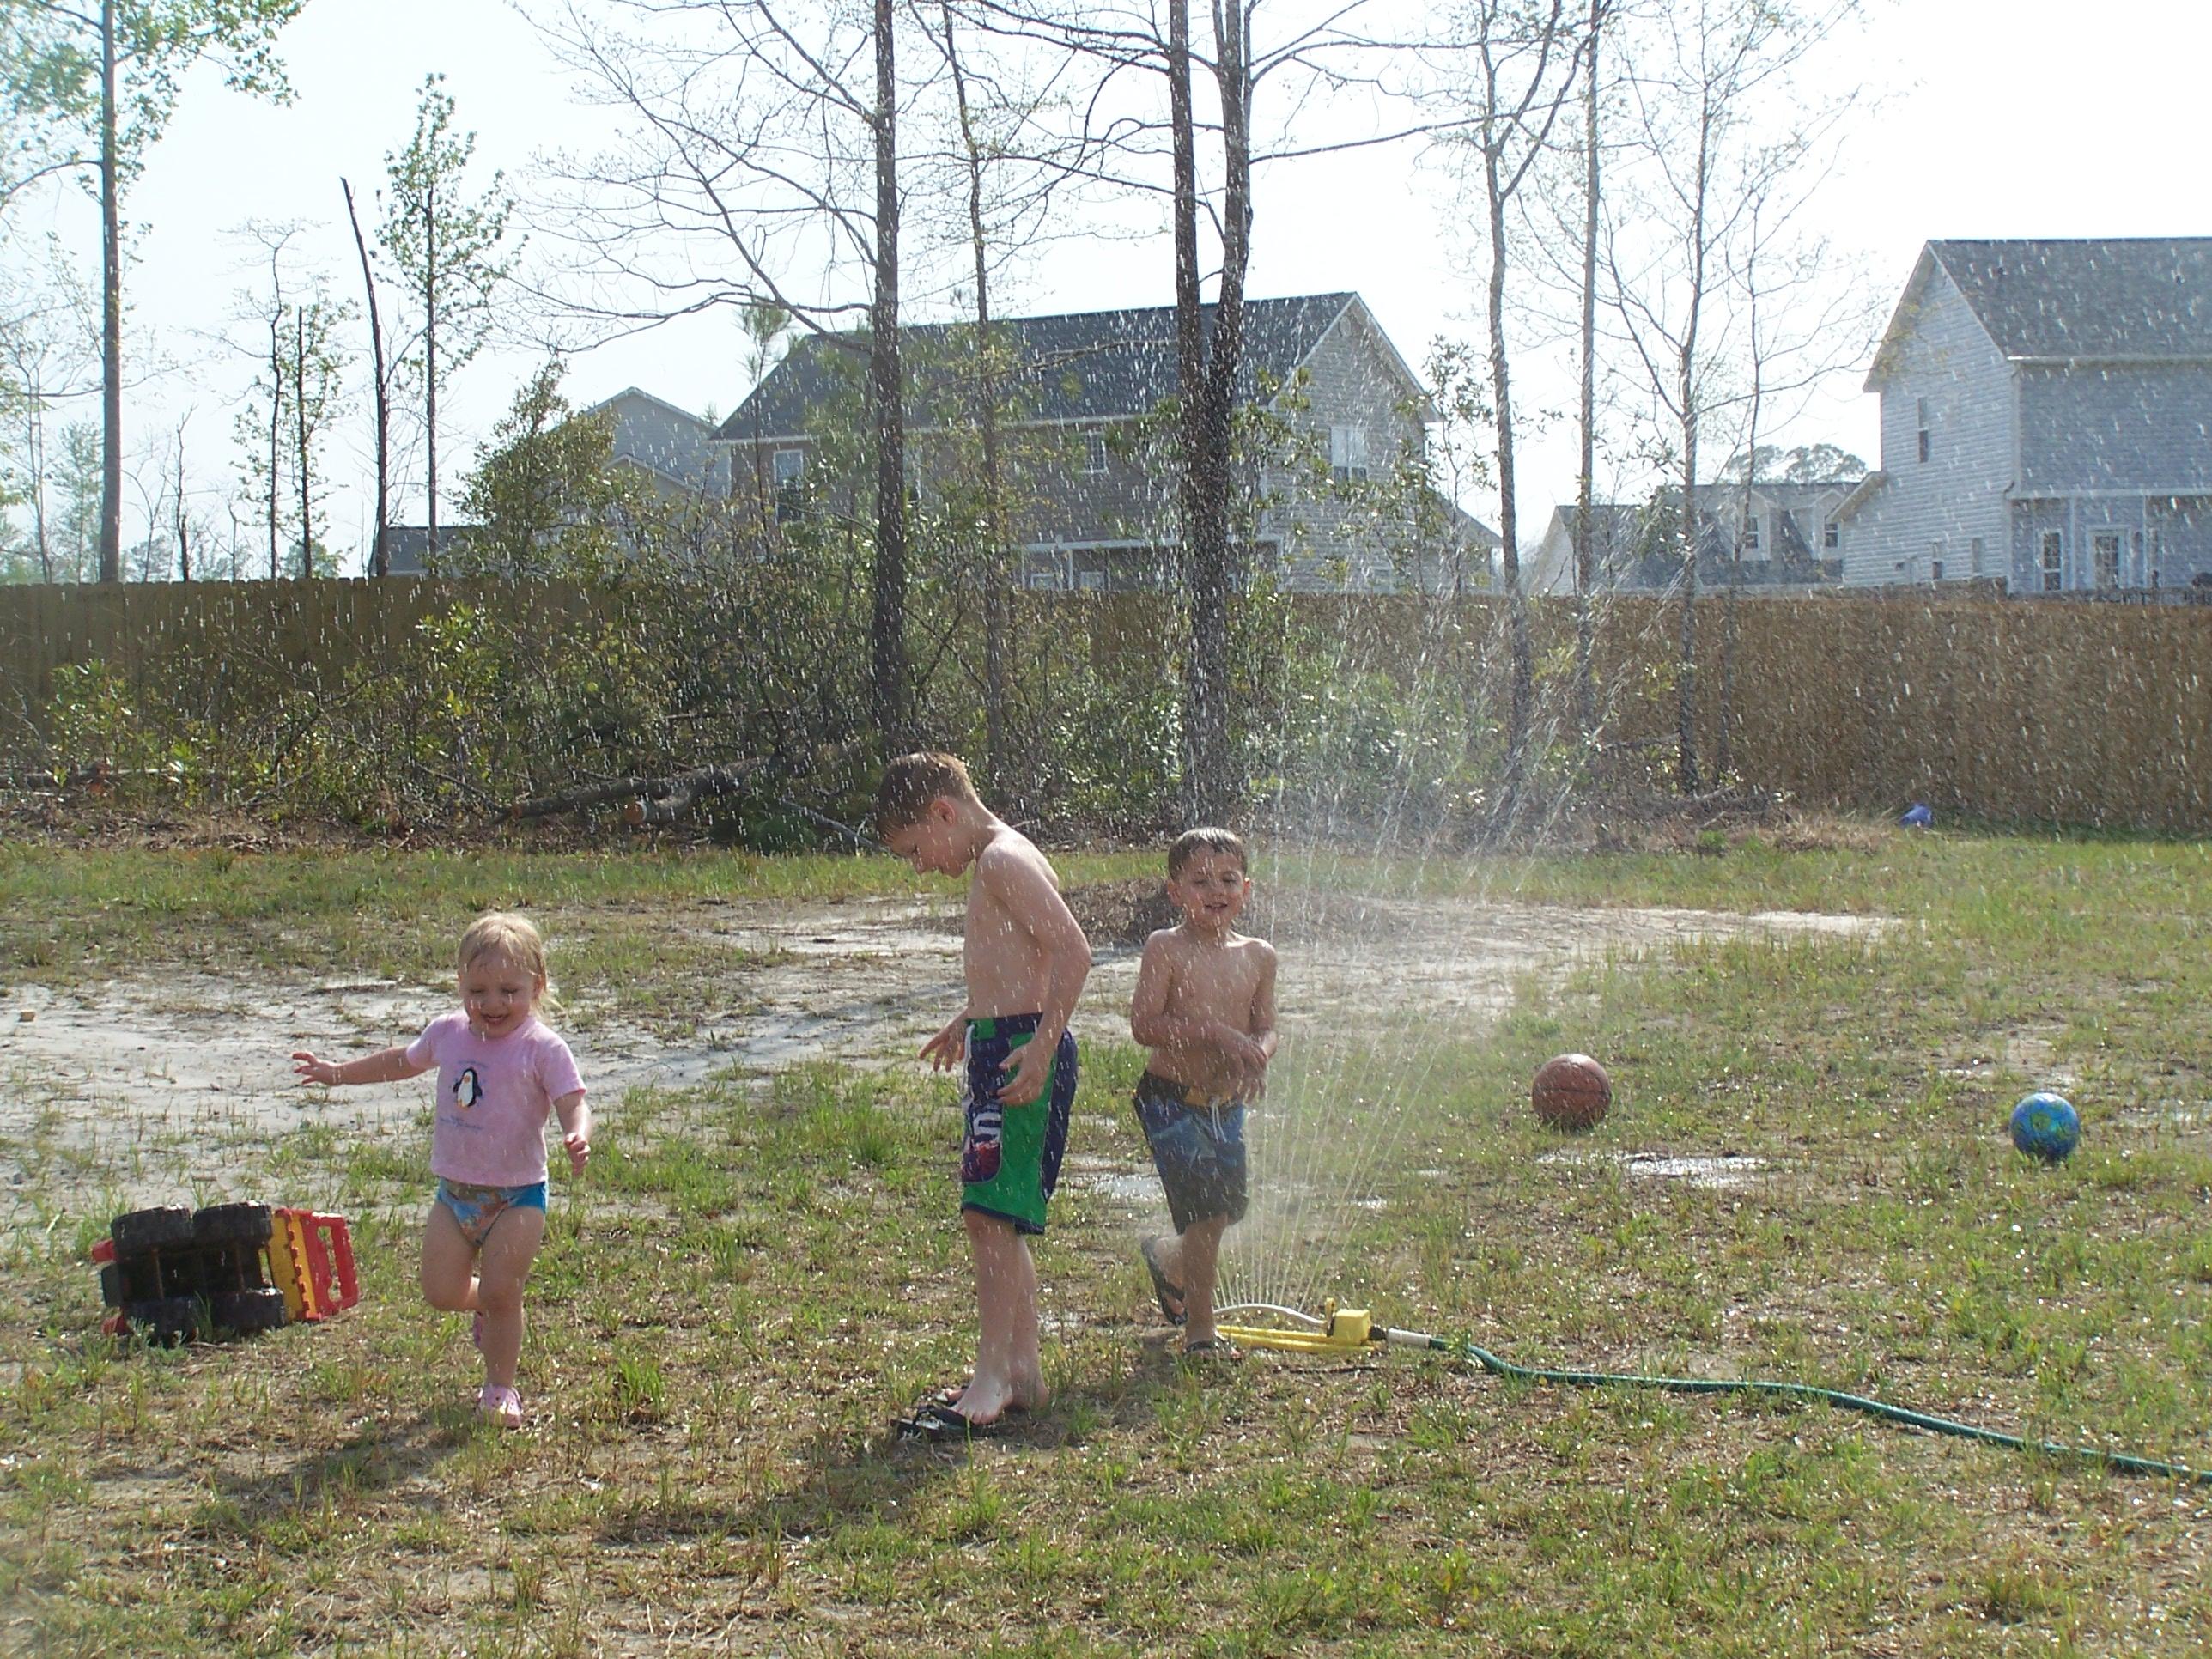 playing in sprinkler